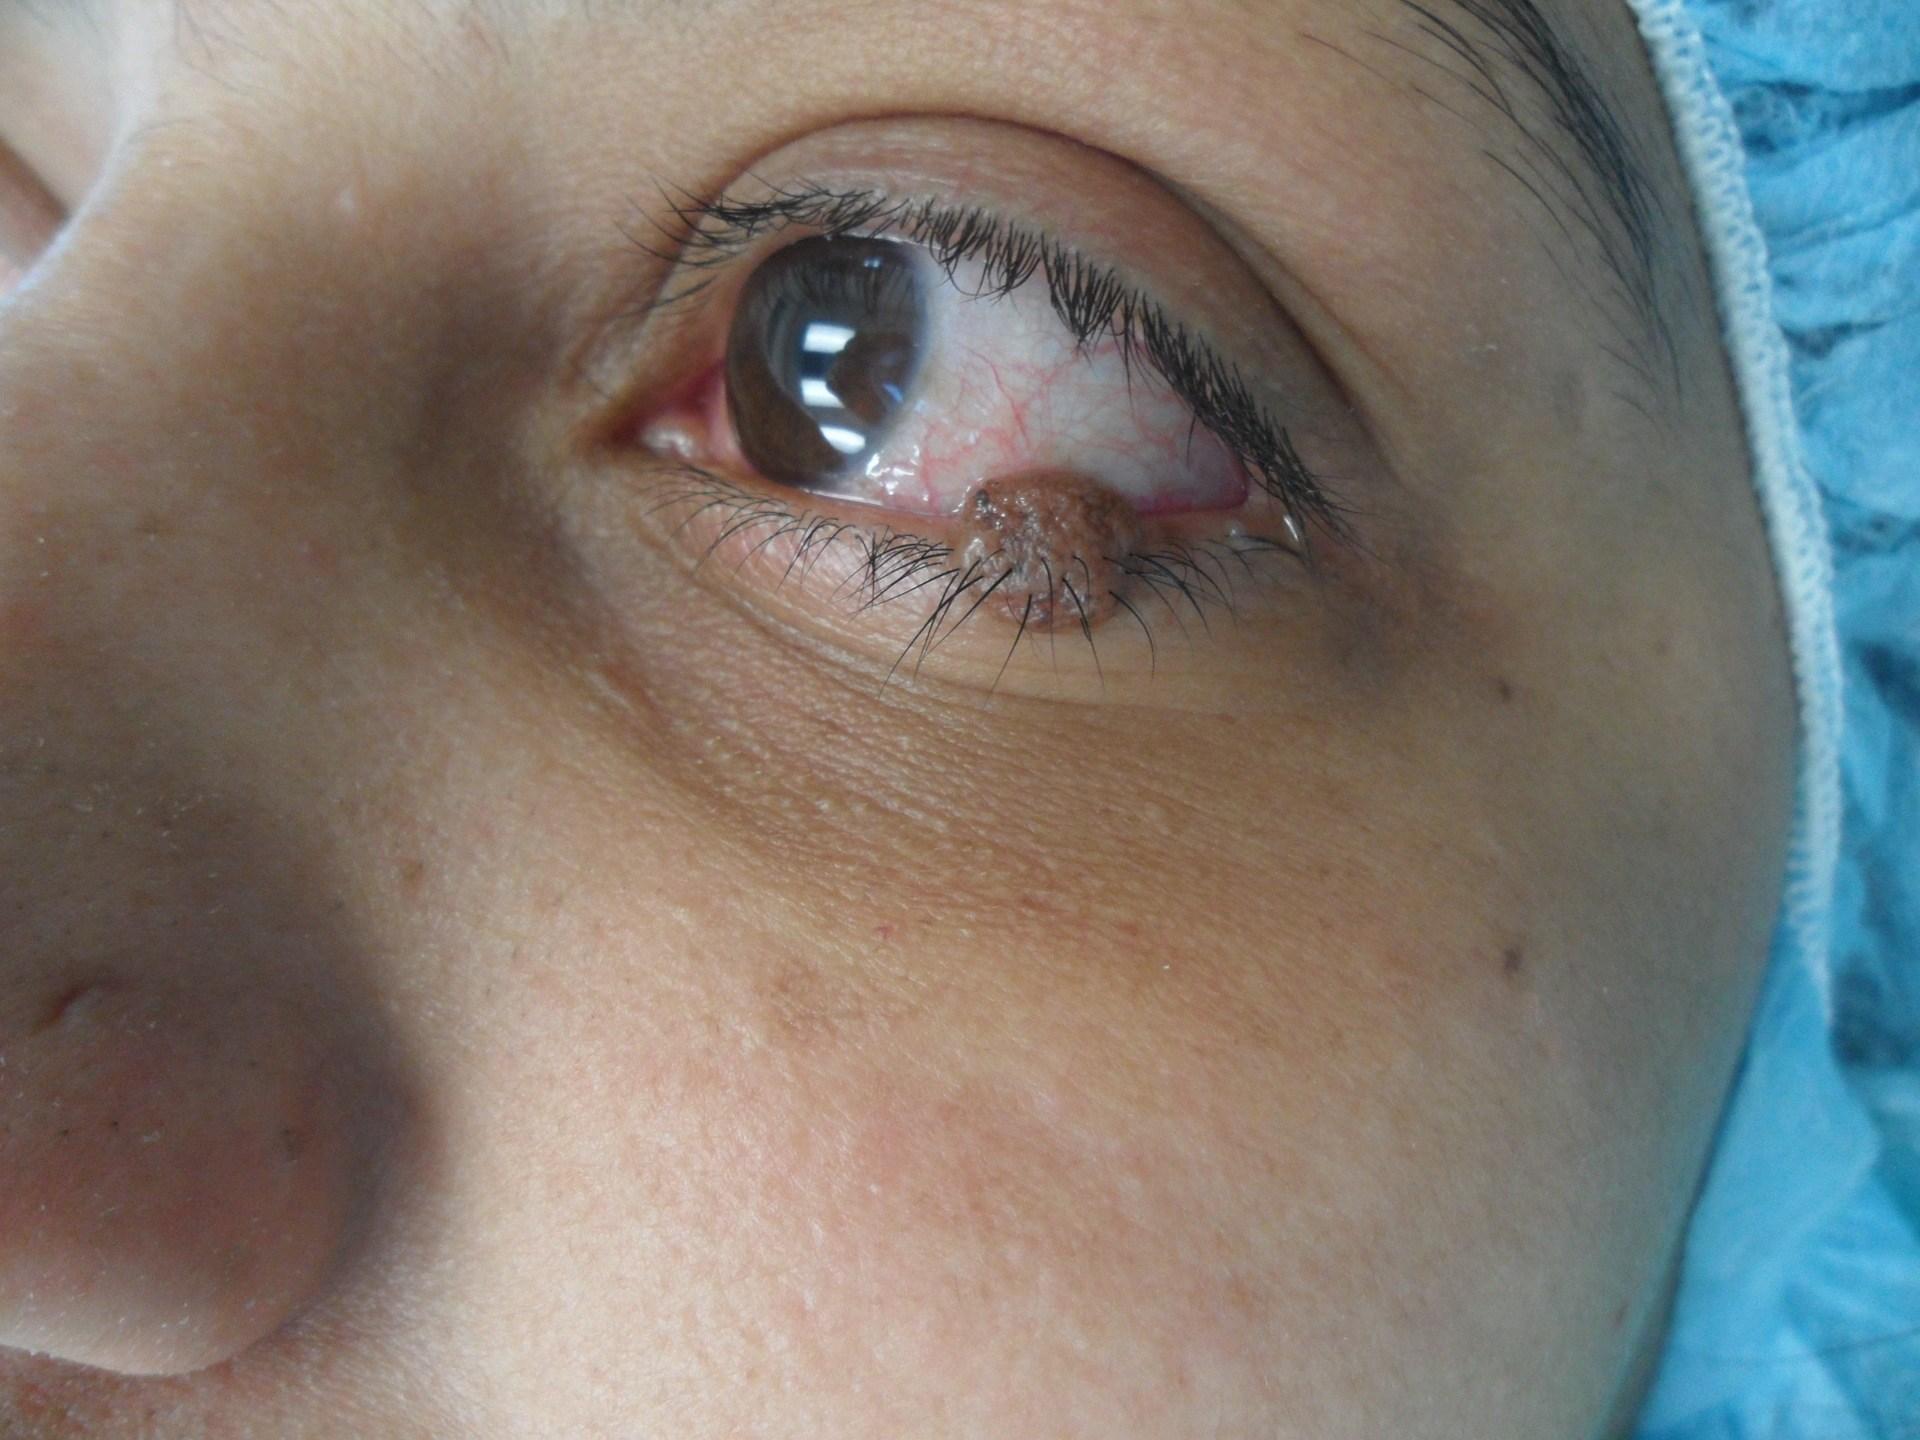 Eyelid needing treatment